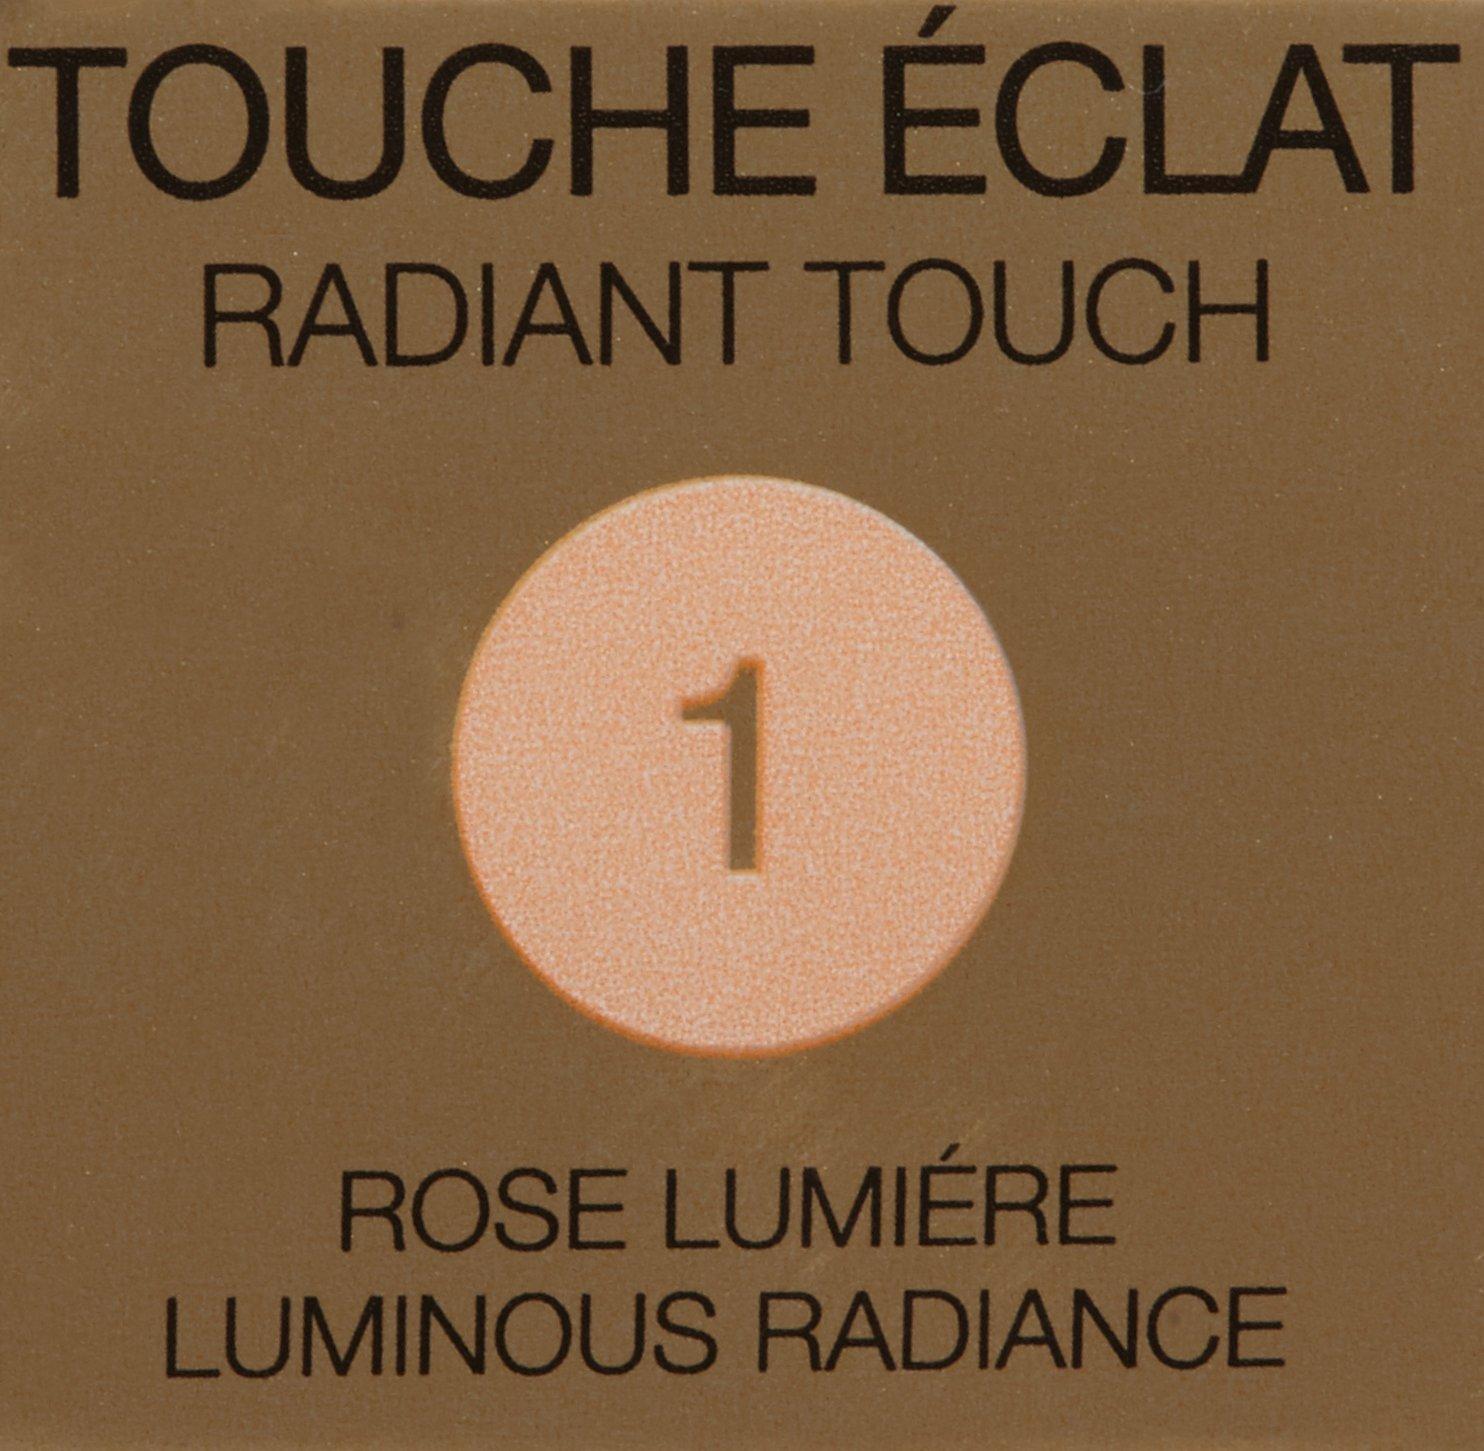 Touche Éclat Face Highlighter Pen by YSL Beauty #19